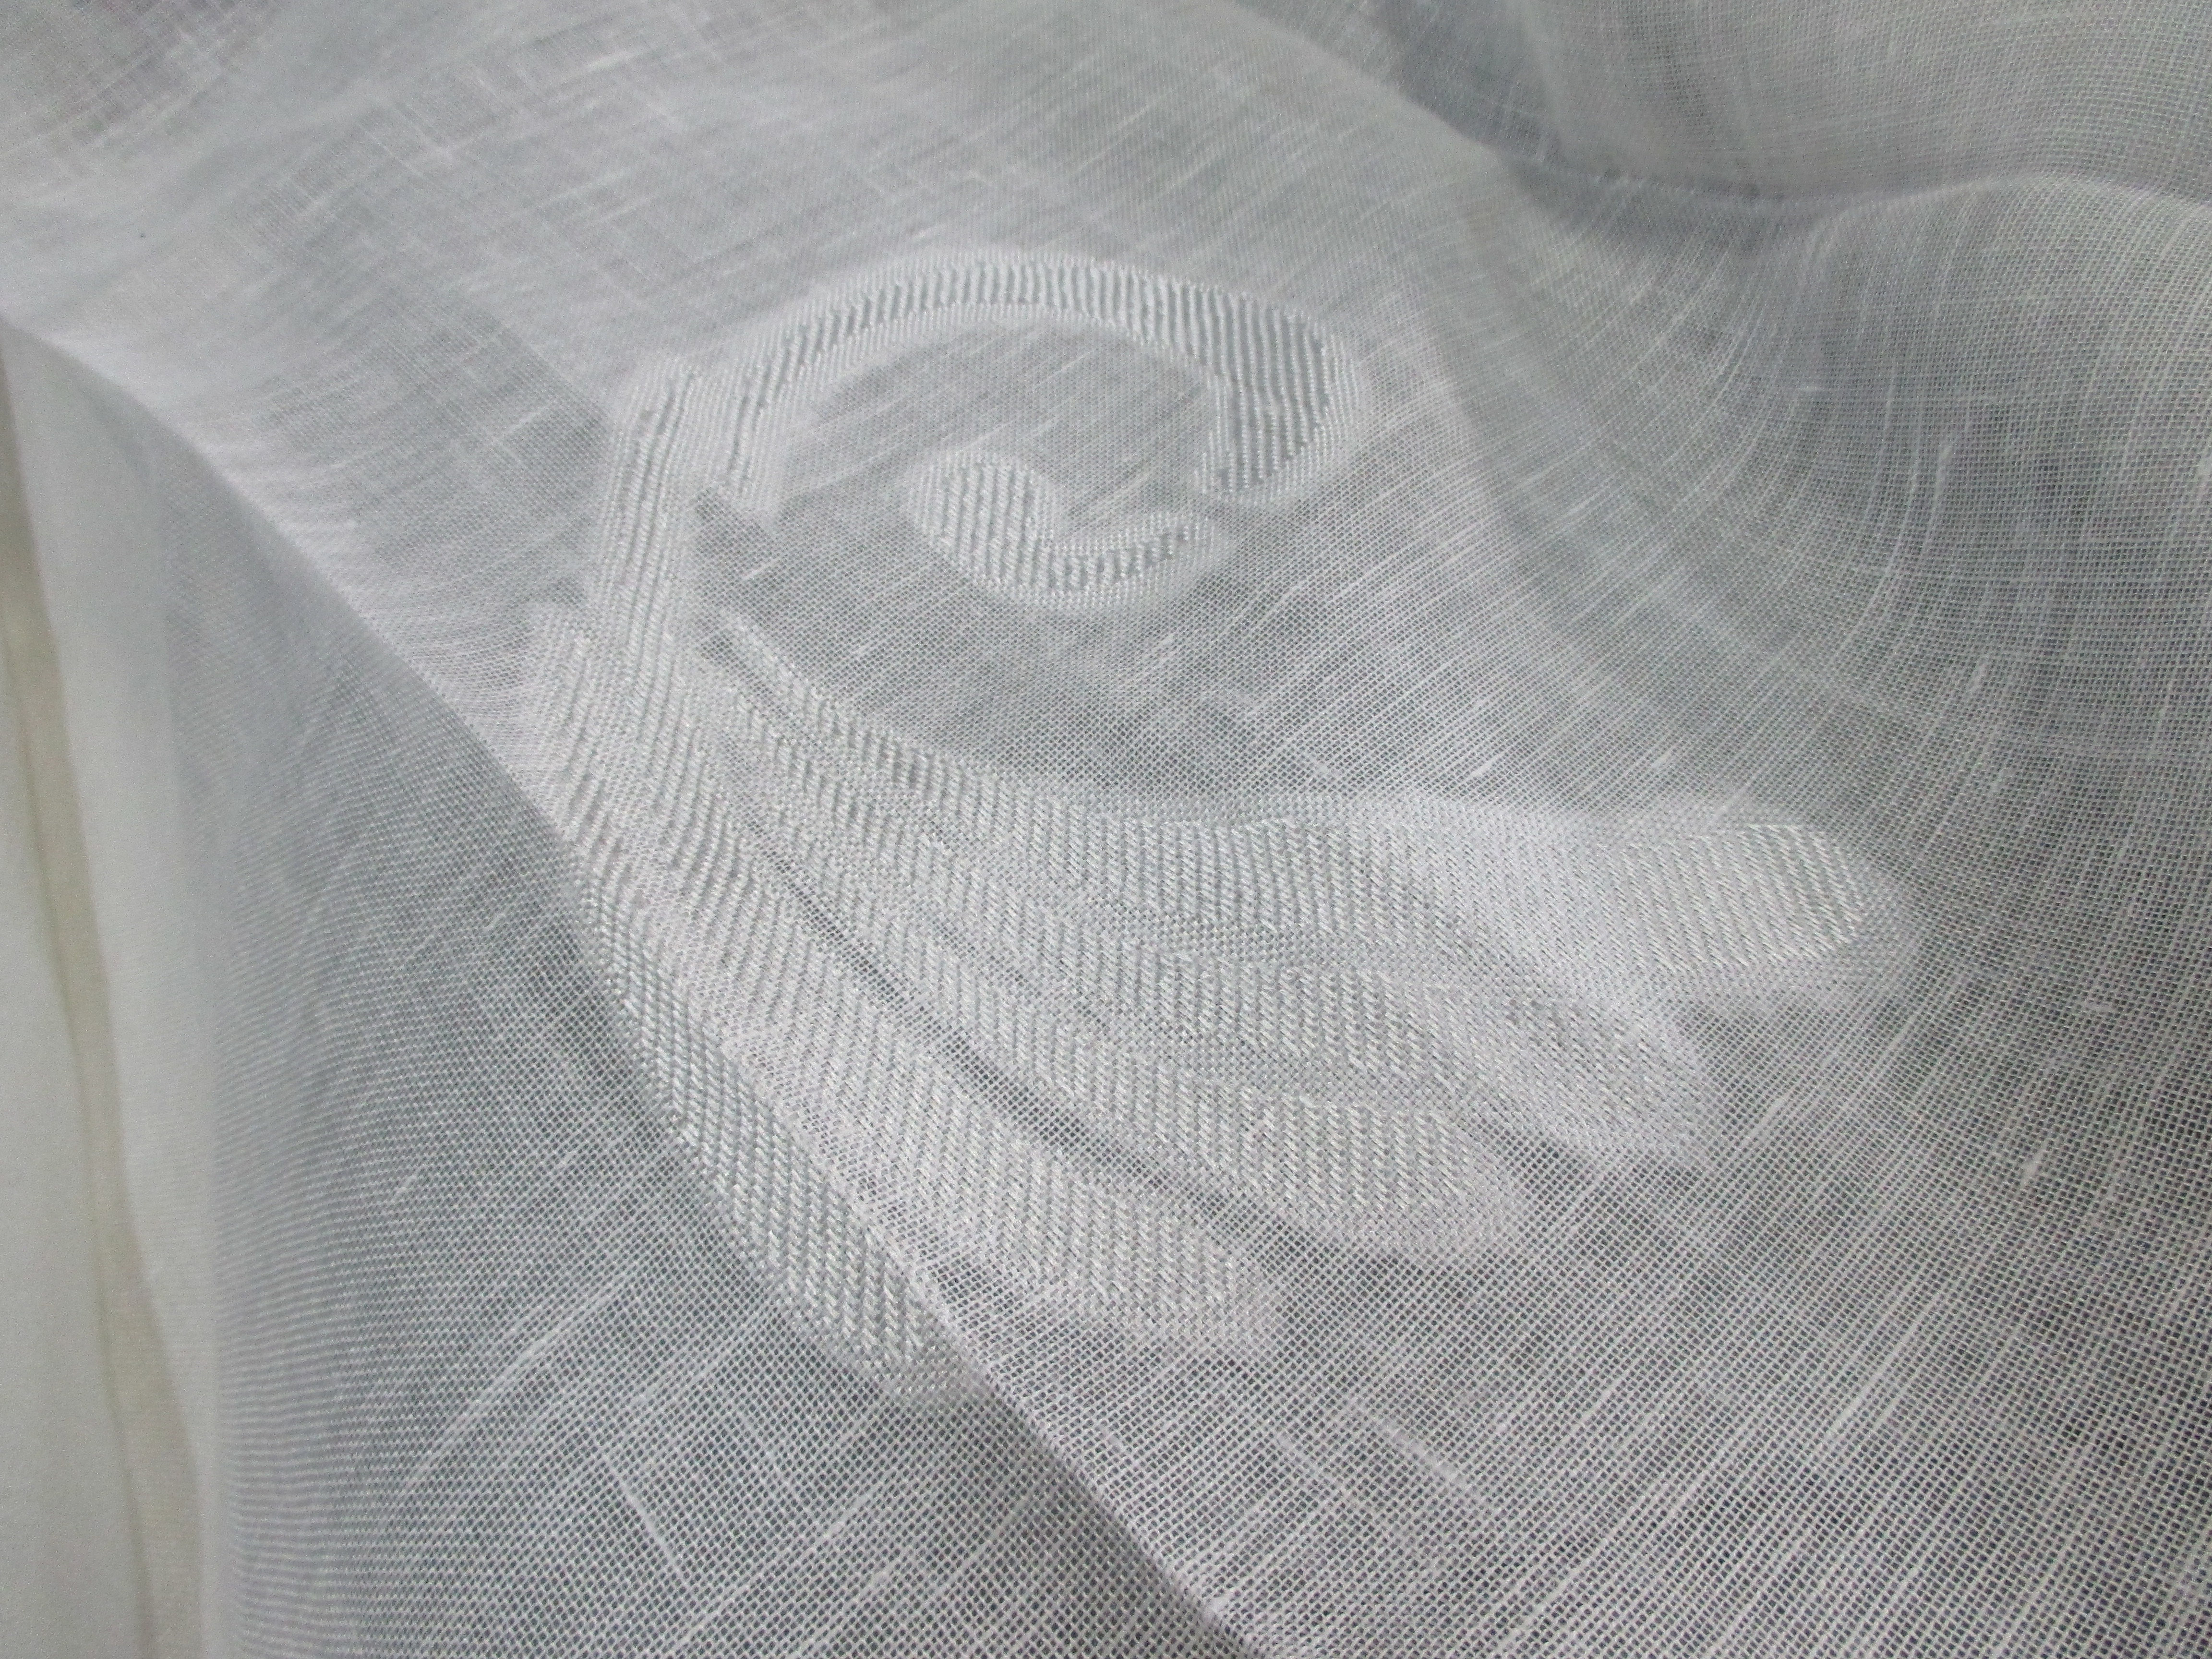 Tessuti parma filati scampoli grignaffini via roma 60 for Tessuti arredamento roma